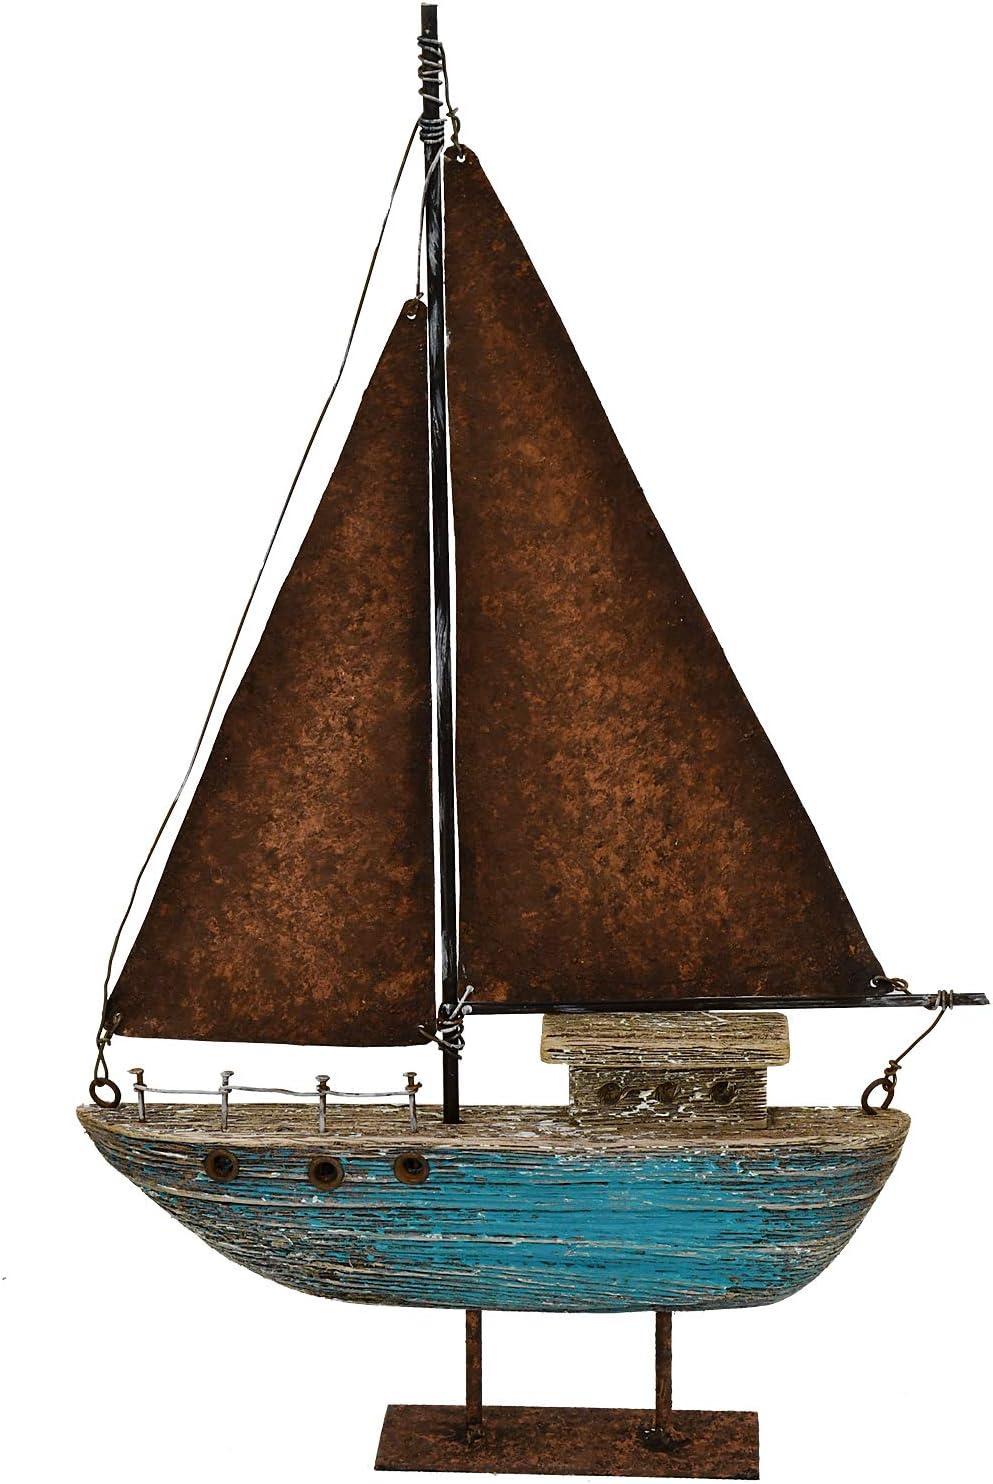 Rustic Wood Sailboat Decor Tabletop Nautical Decor, Wooden Sailboat Nautical Decoration Beach Themed Decoration Coastal Decor Sailboat Decoration for Home Mediterranean Decor (Blue)